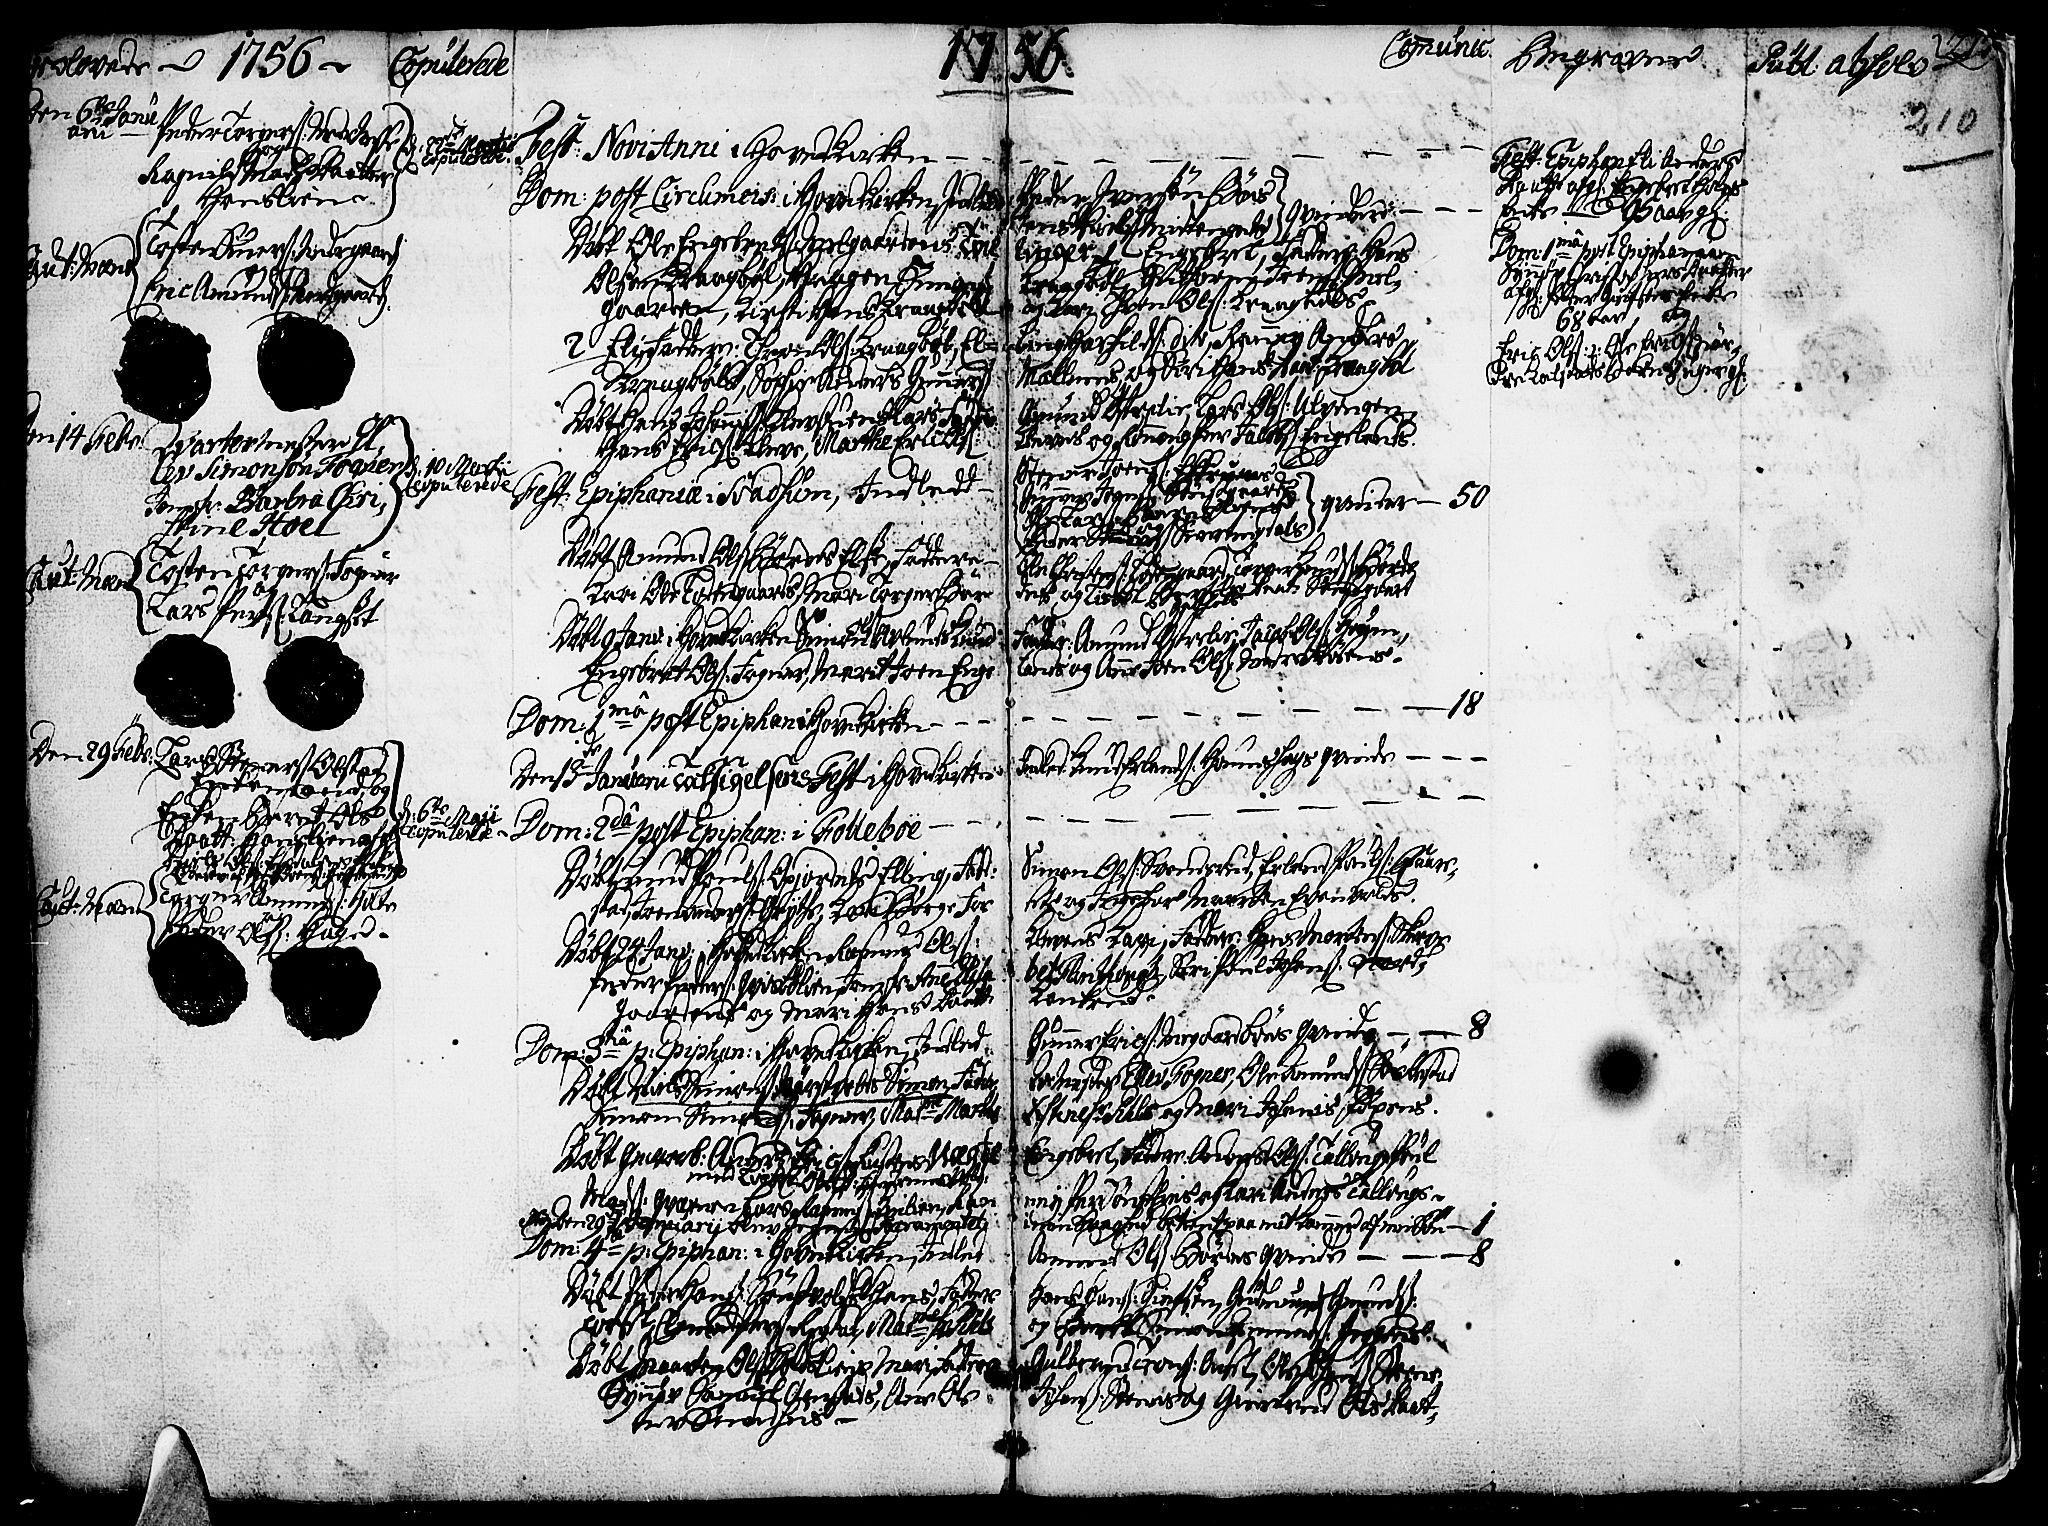 SAH, Gausdal prestekontor, Ministerialbok nr. 2, 1729-1757, s. 210